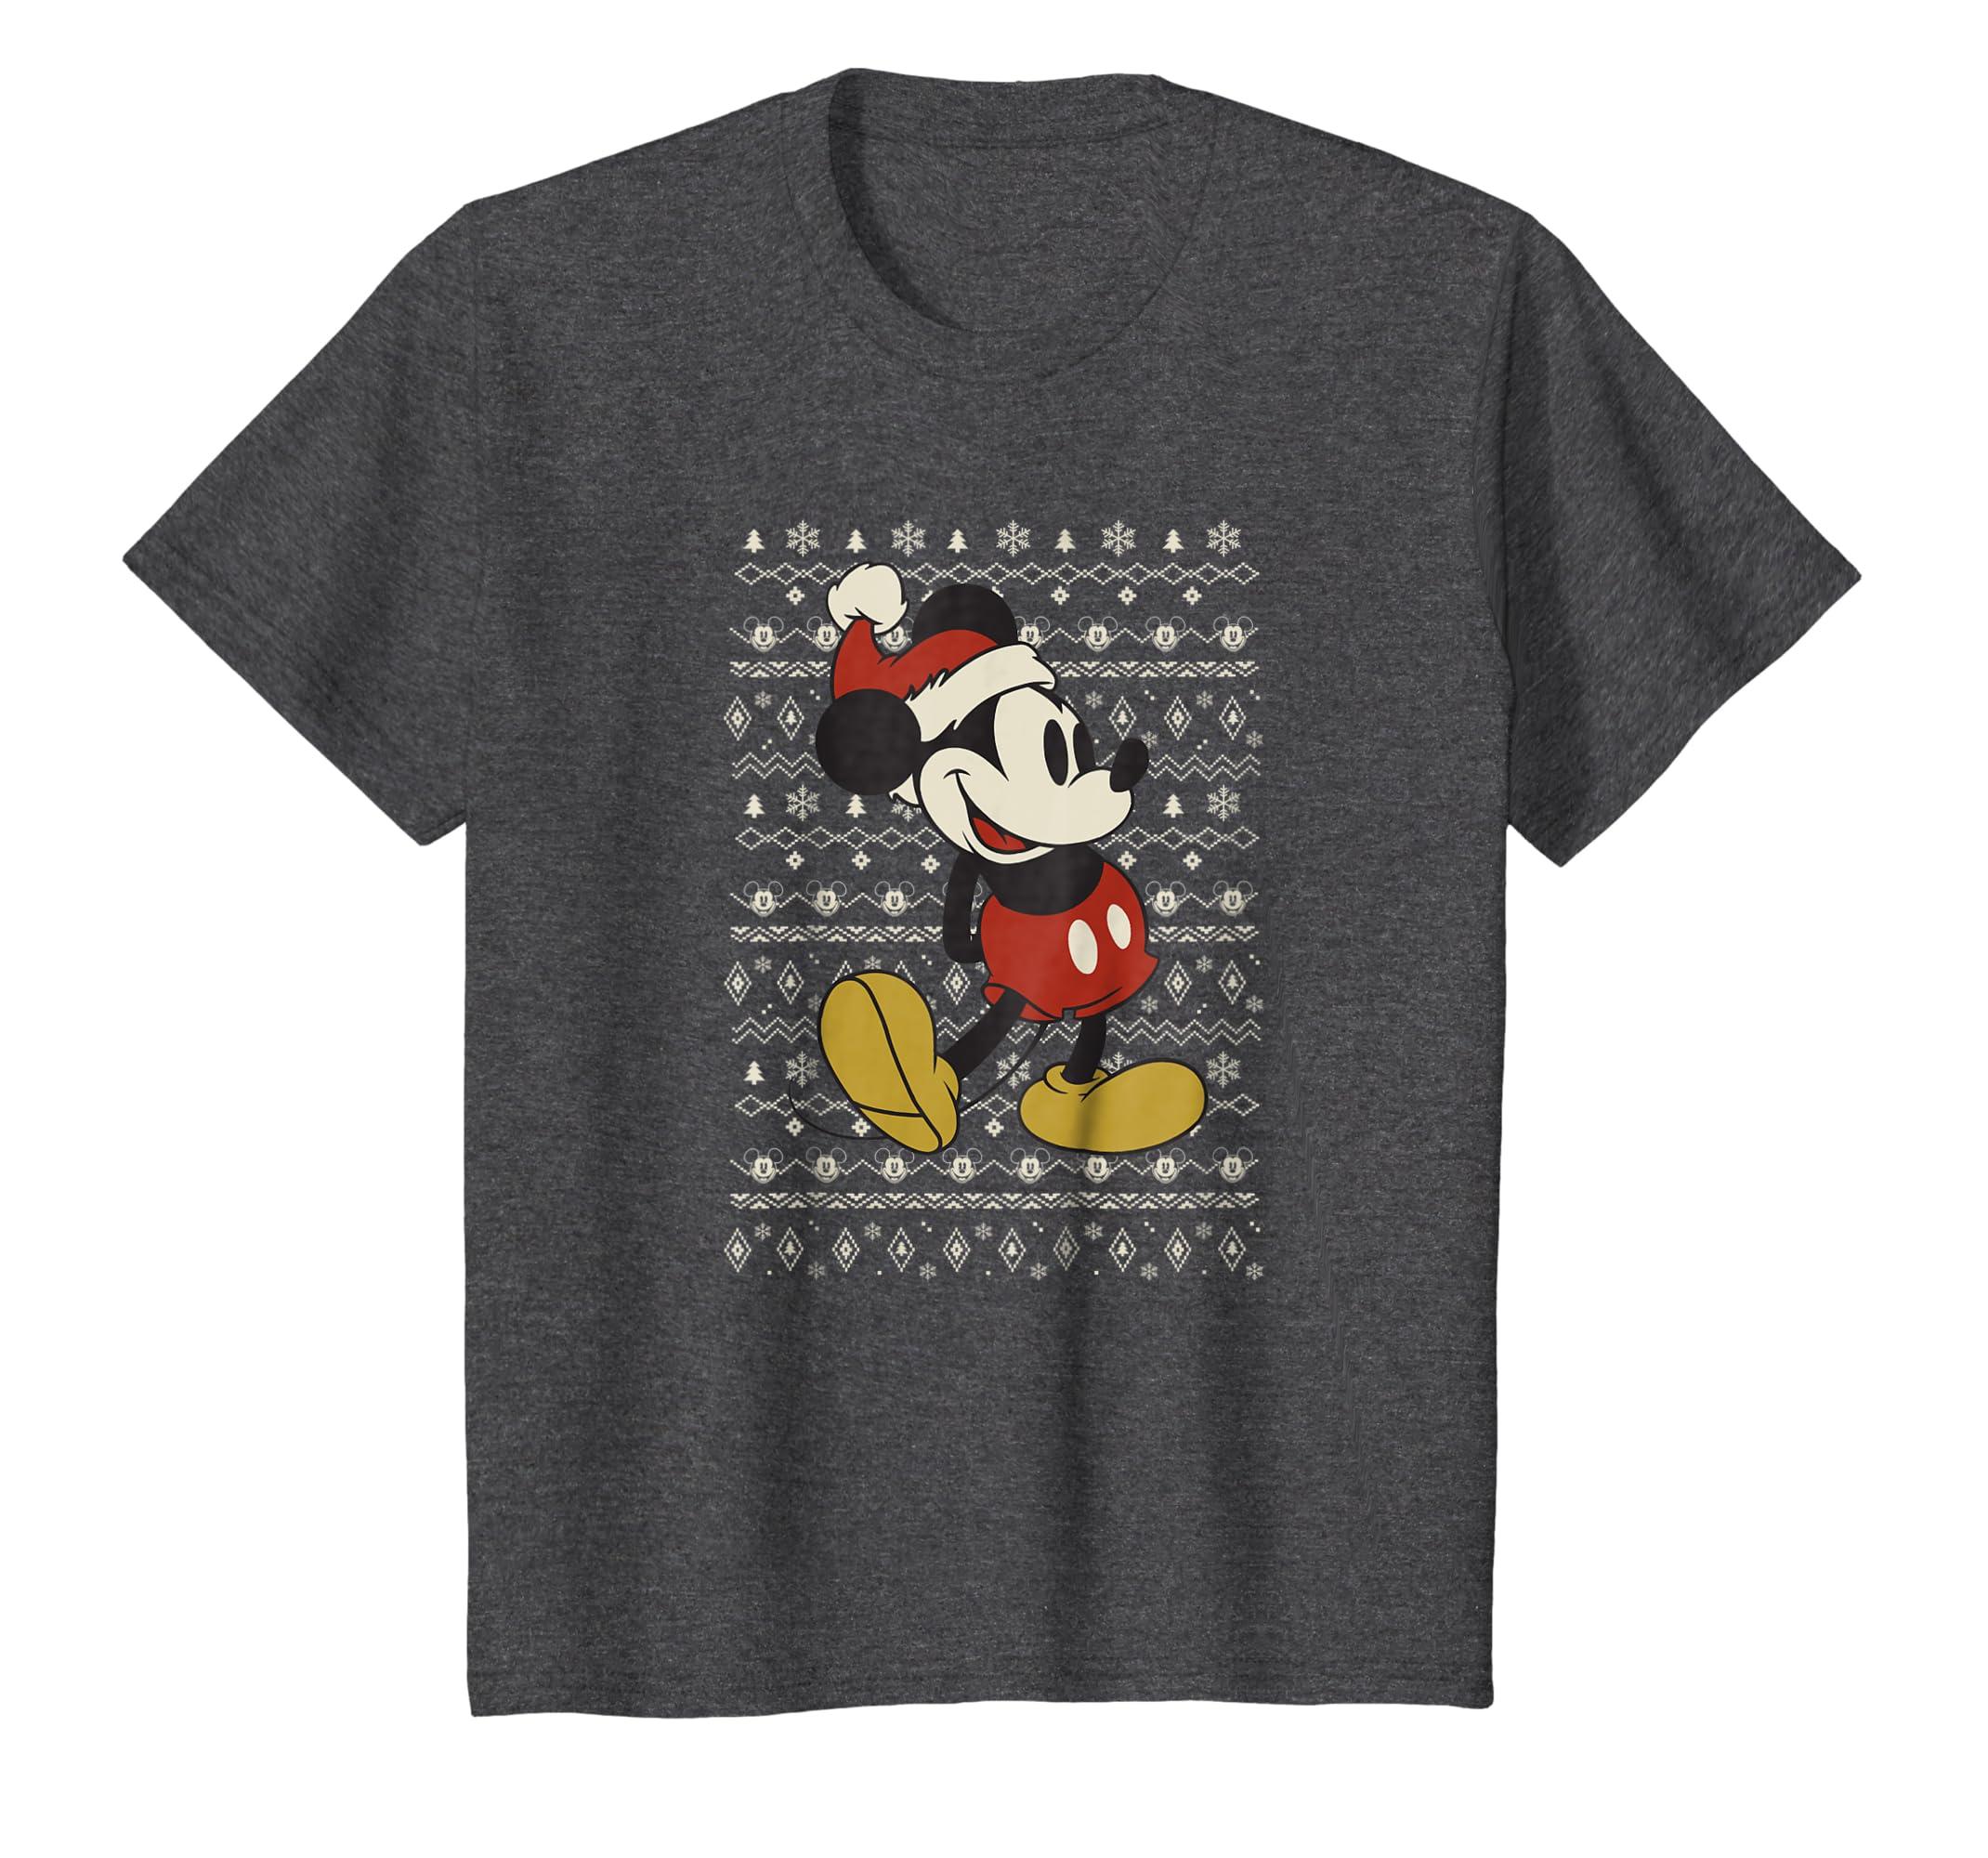 5743bd770 Amazon.com  Disney Vintage Mickey Mouse Christmas T-Shirt  Clothing